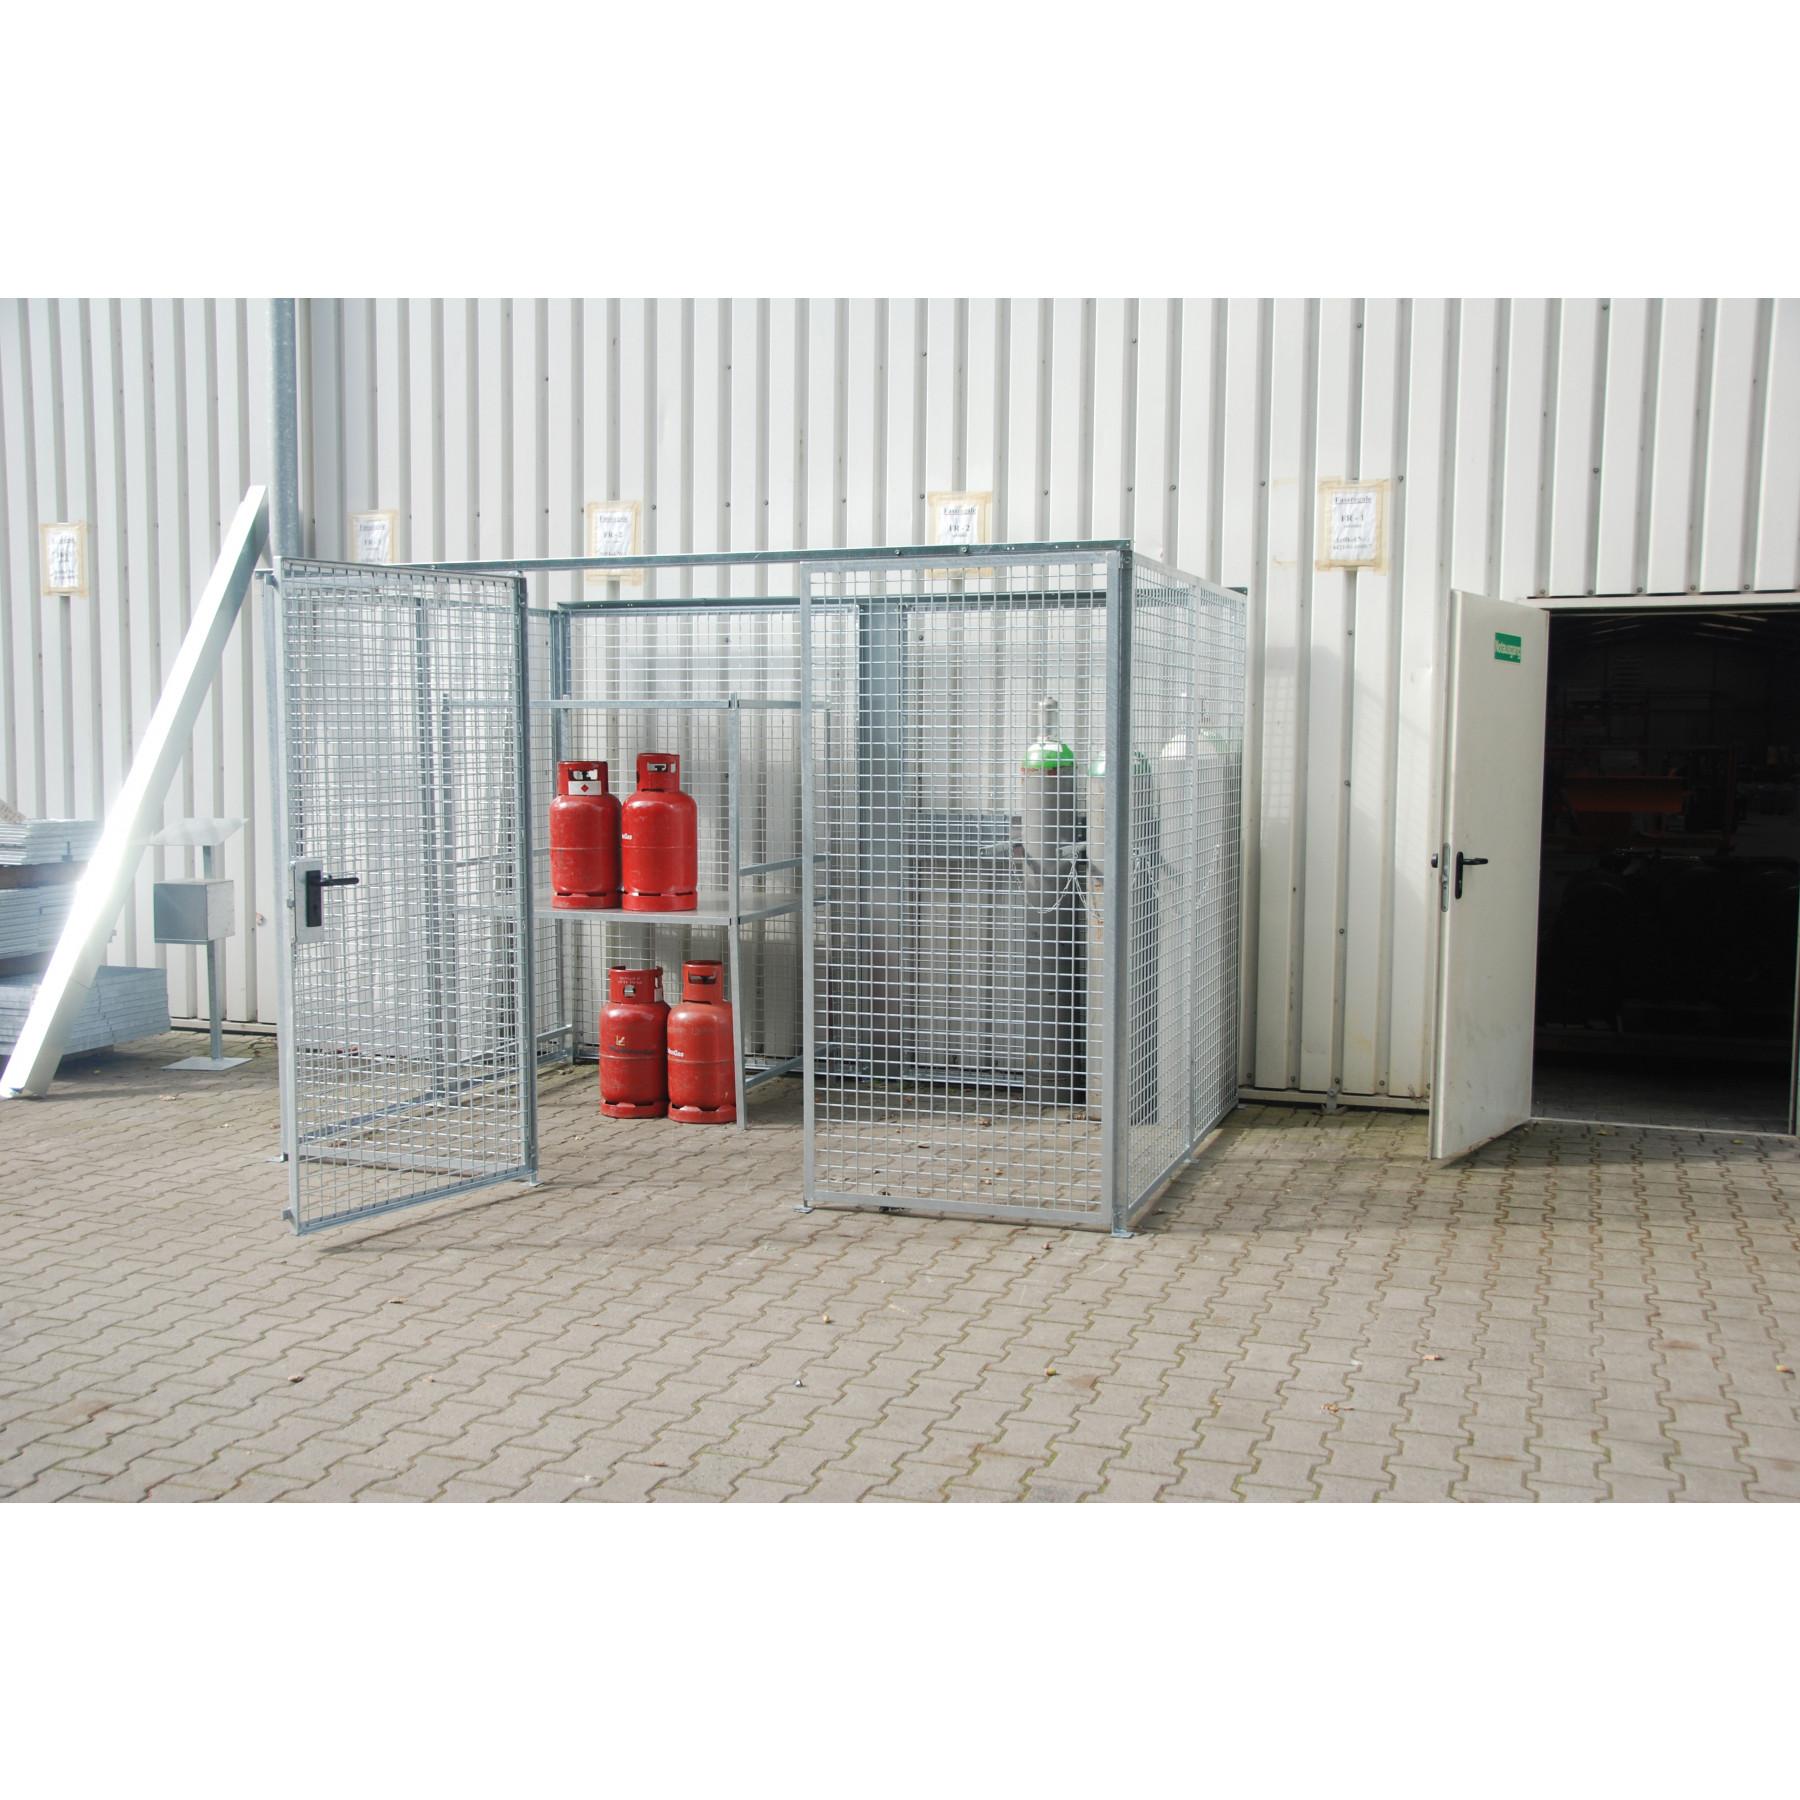 Gasflessencontainer zonder dak voor 60 gasflessen, GFC-M3